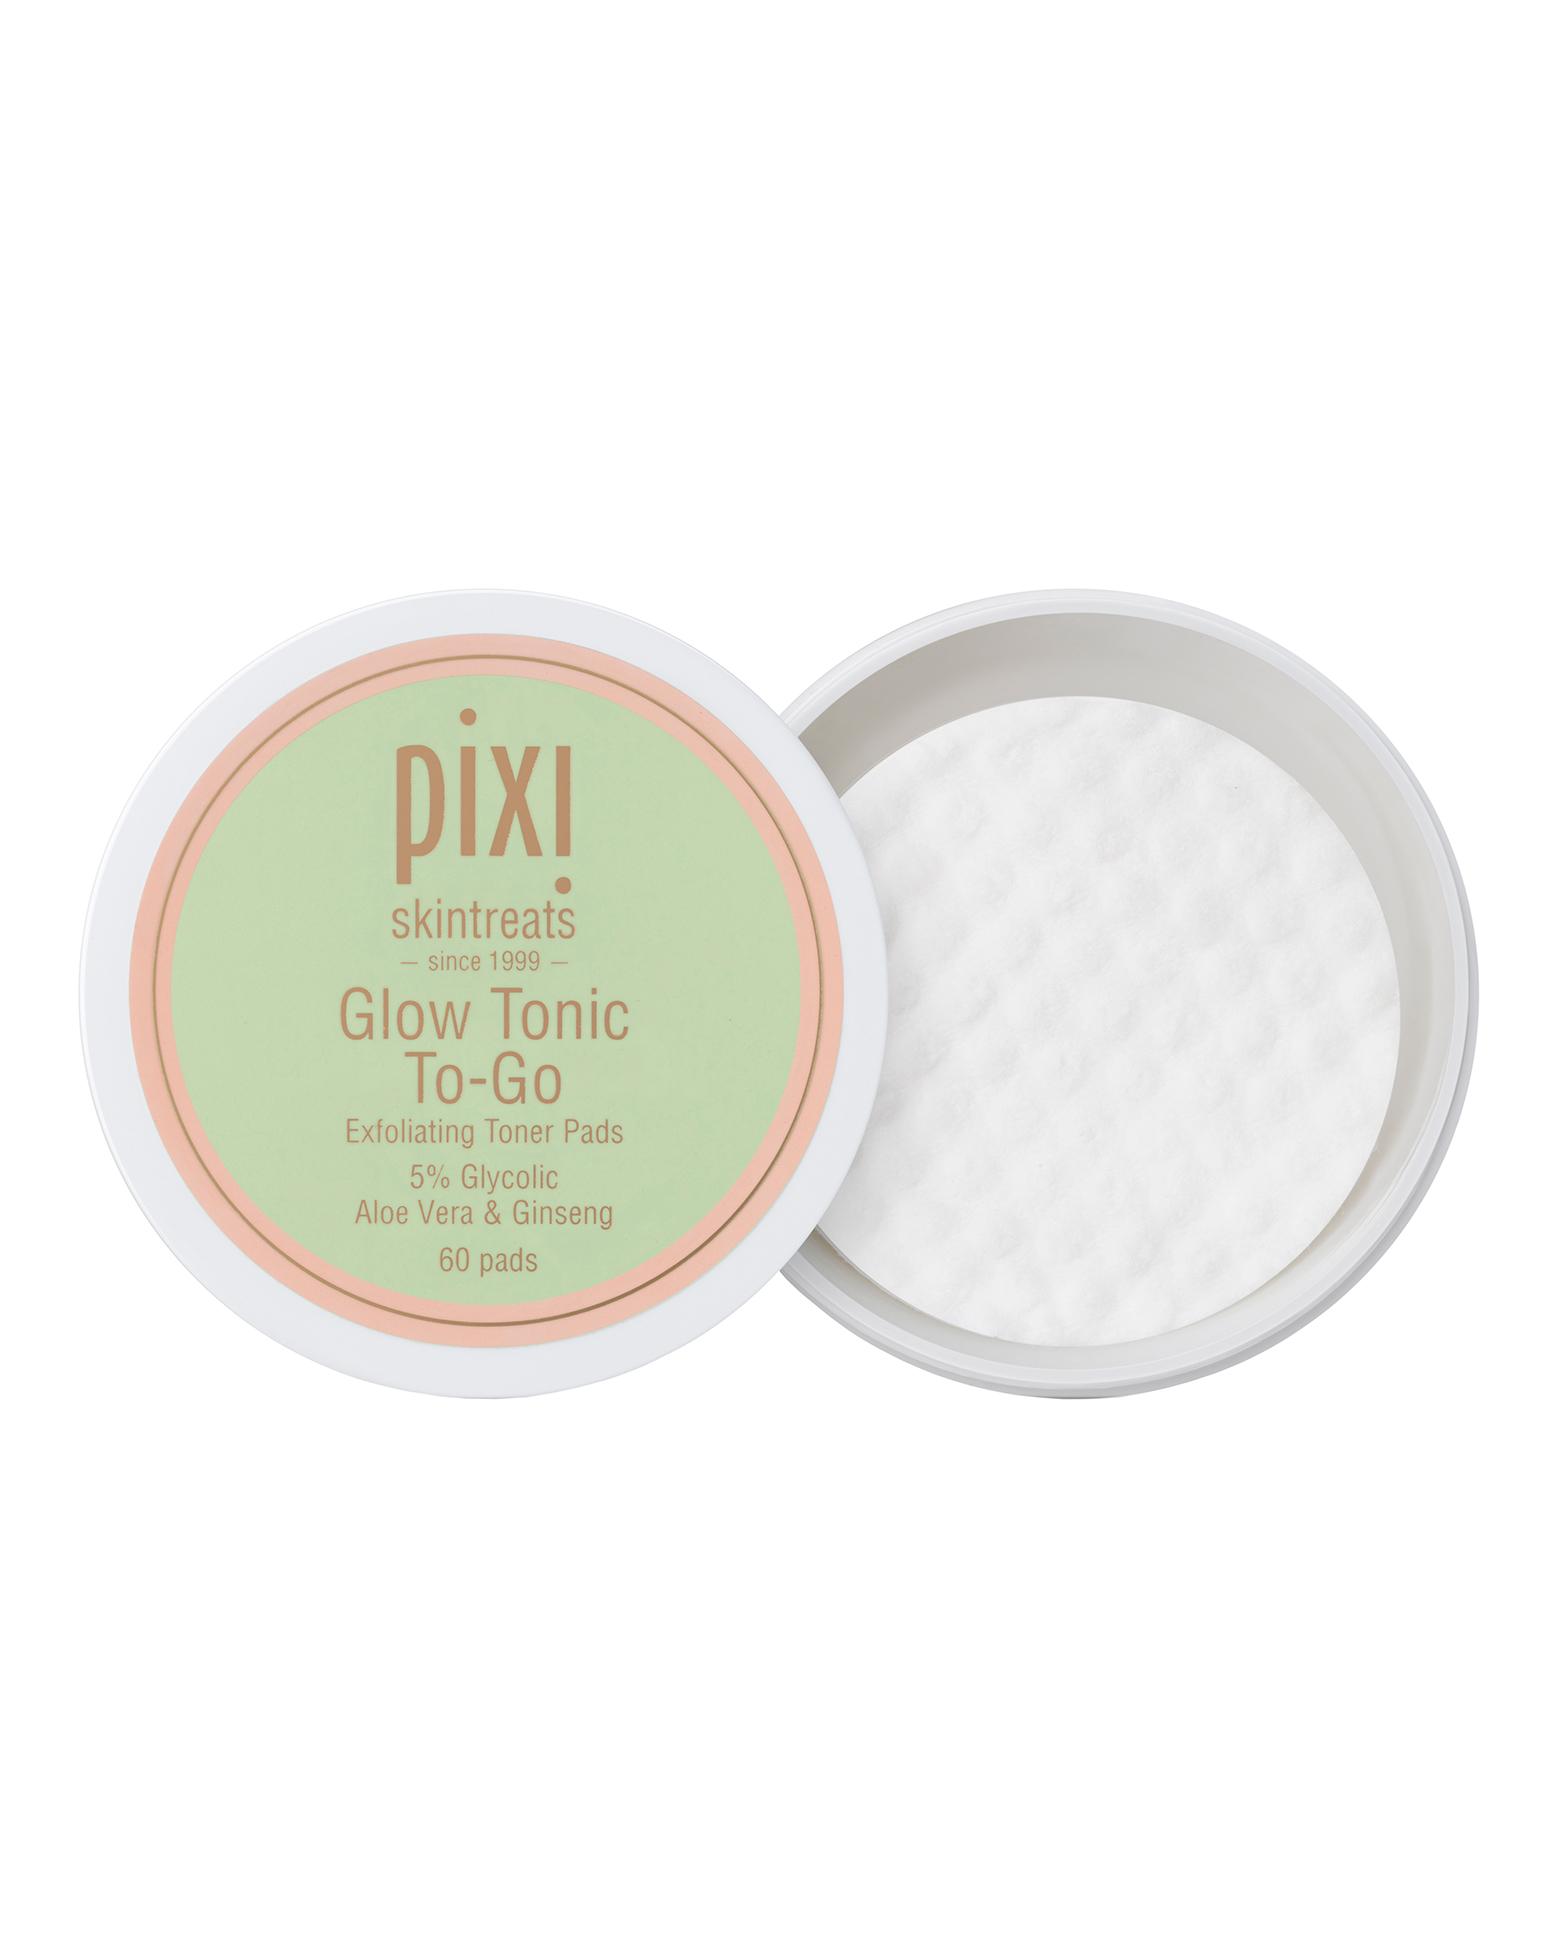 Pixi Glow Tonic To-Go Exfoliating Toner Pads